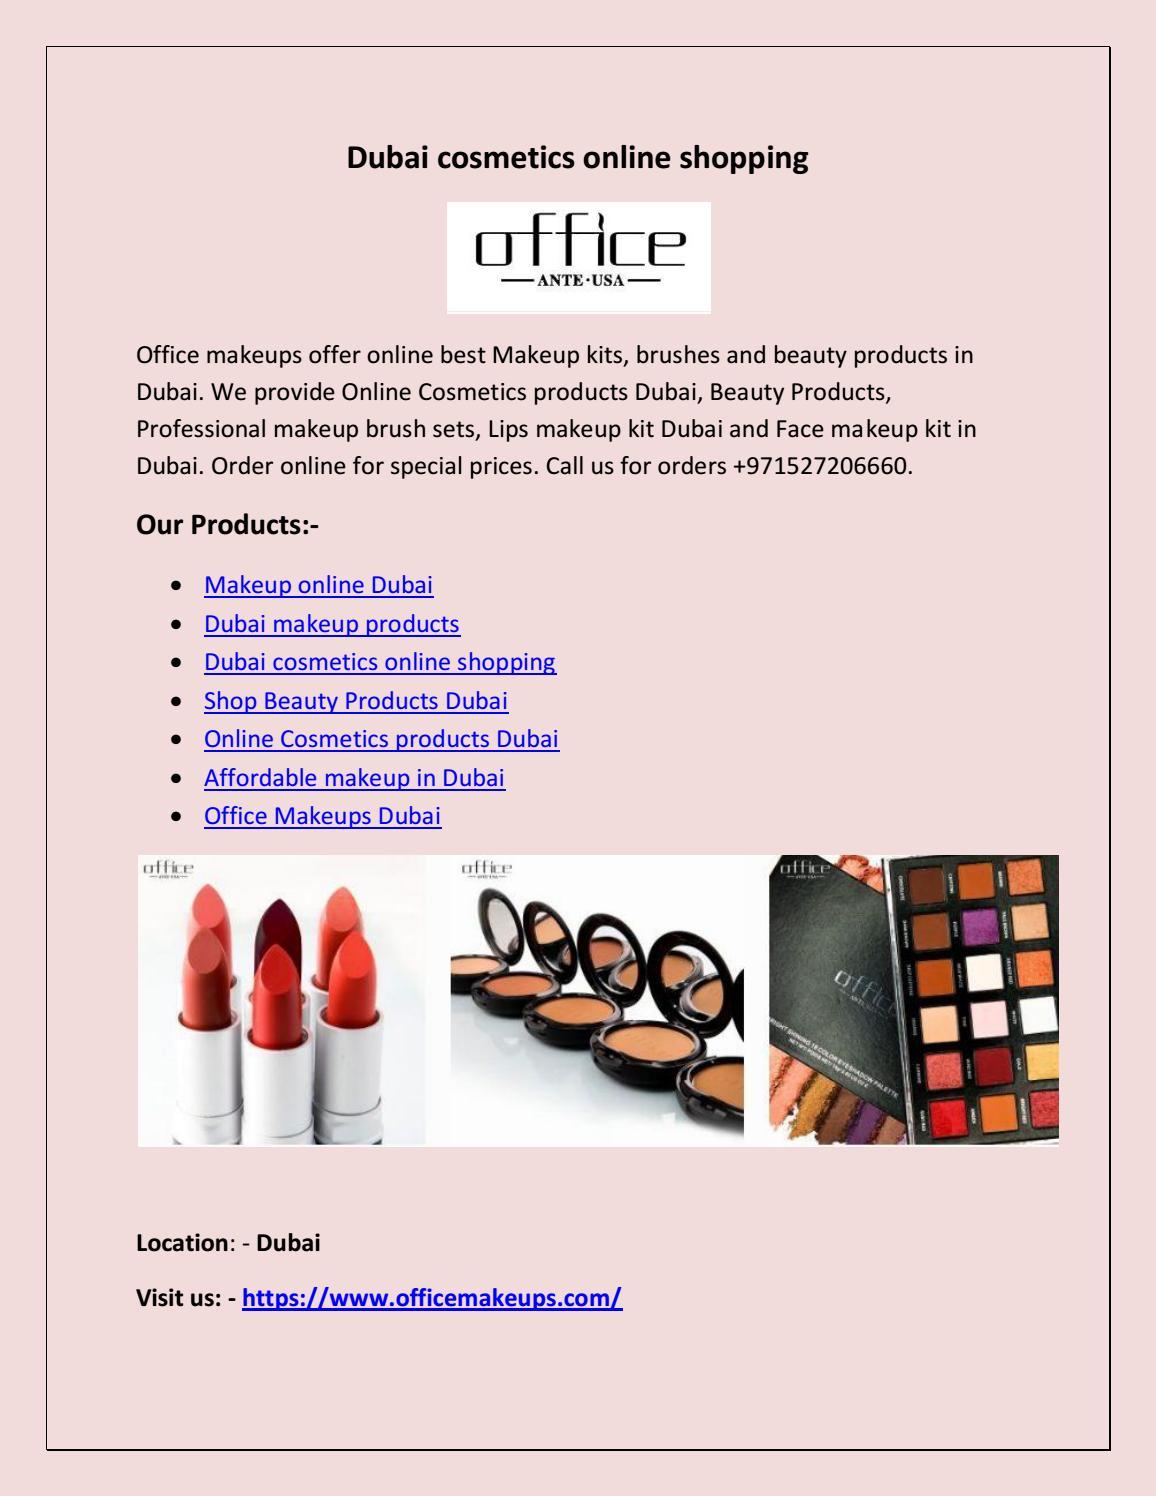 Dubai Cosmetics Online Ping By